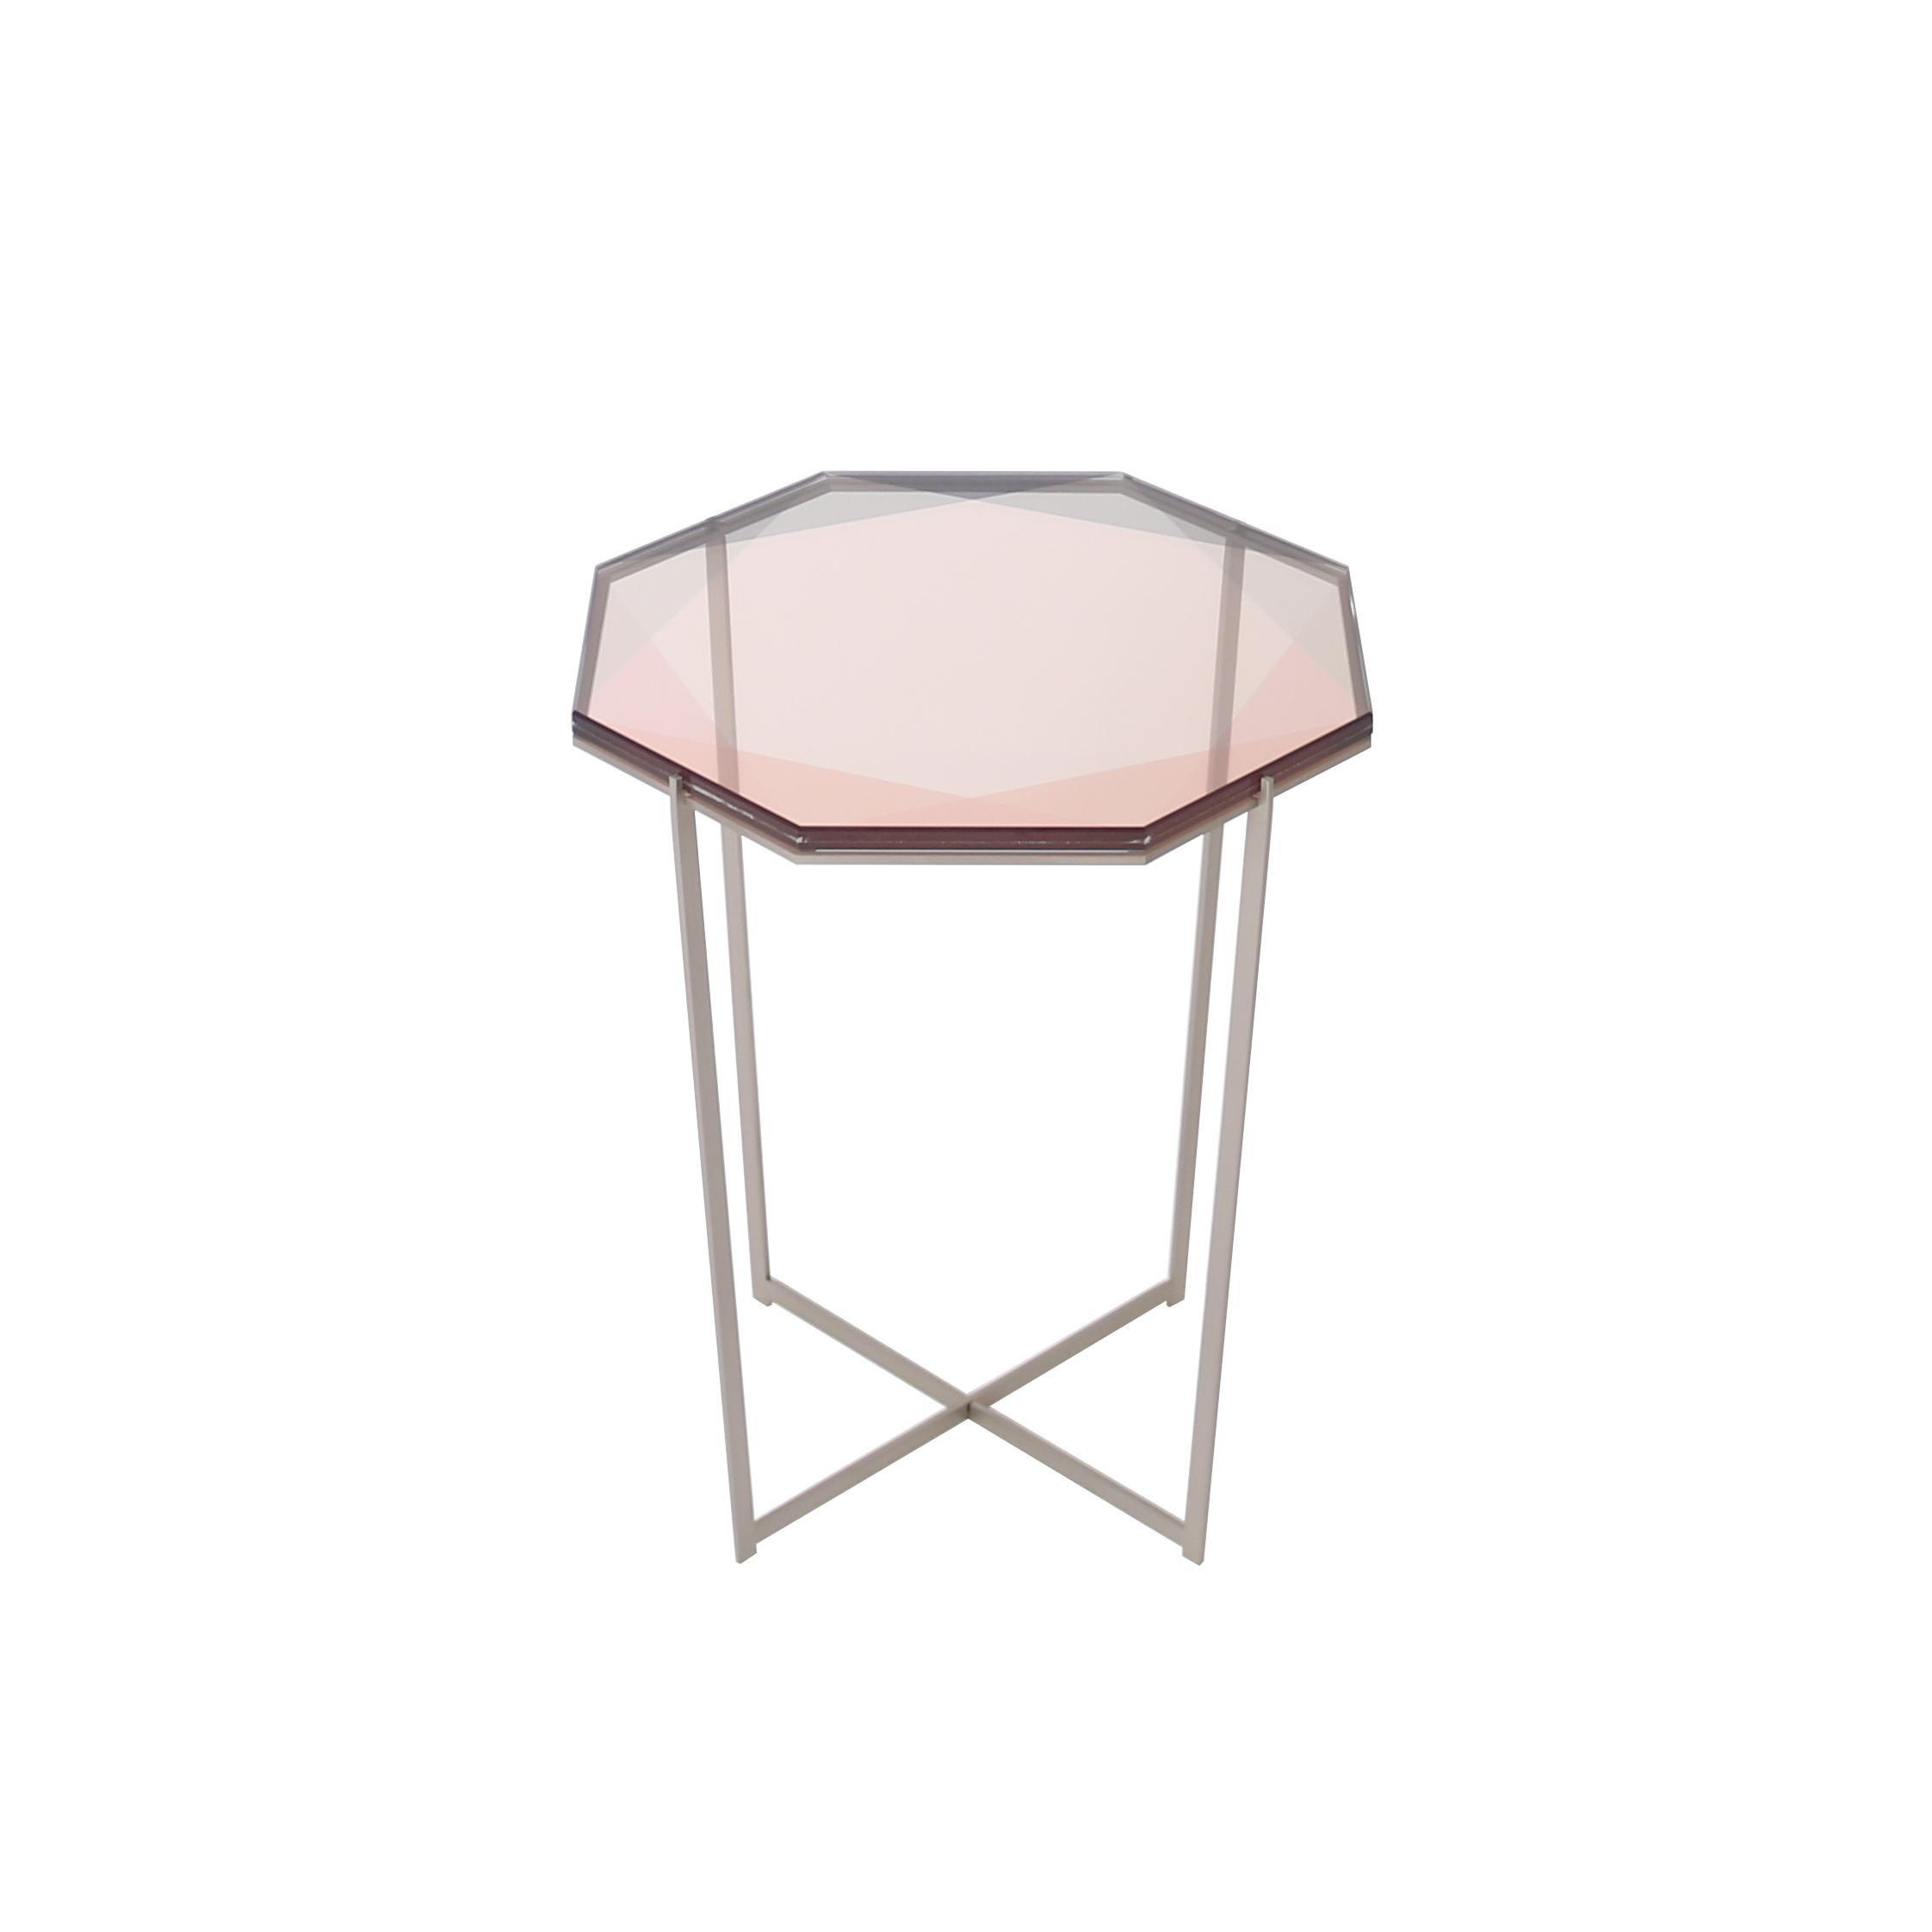 Gem Side Table - Blush Glass w/ Stainless Steel Base by Debra Folz